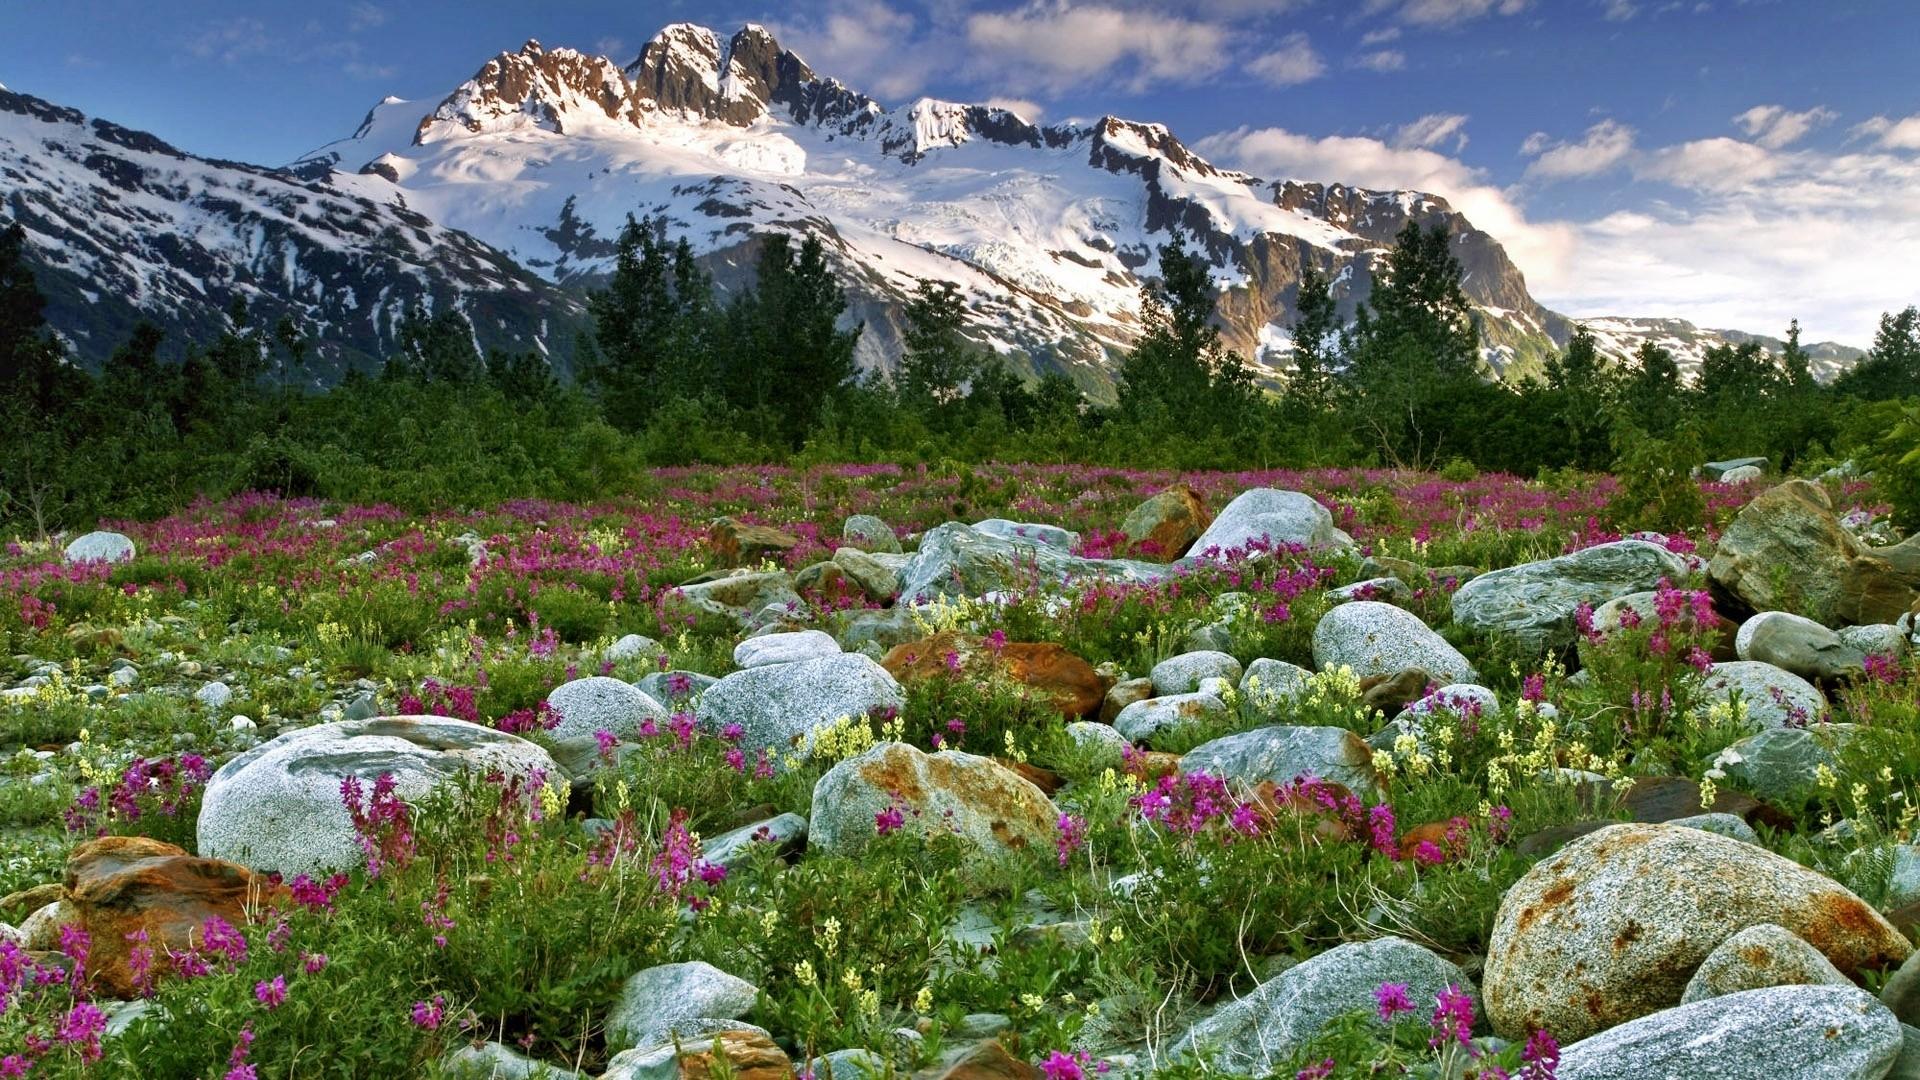 Alsek River Valley, Alaska  № 2454922 загрузить